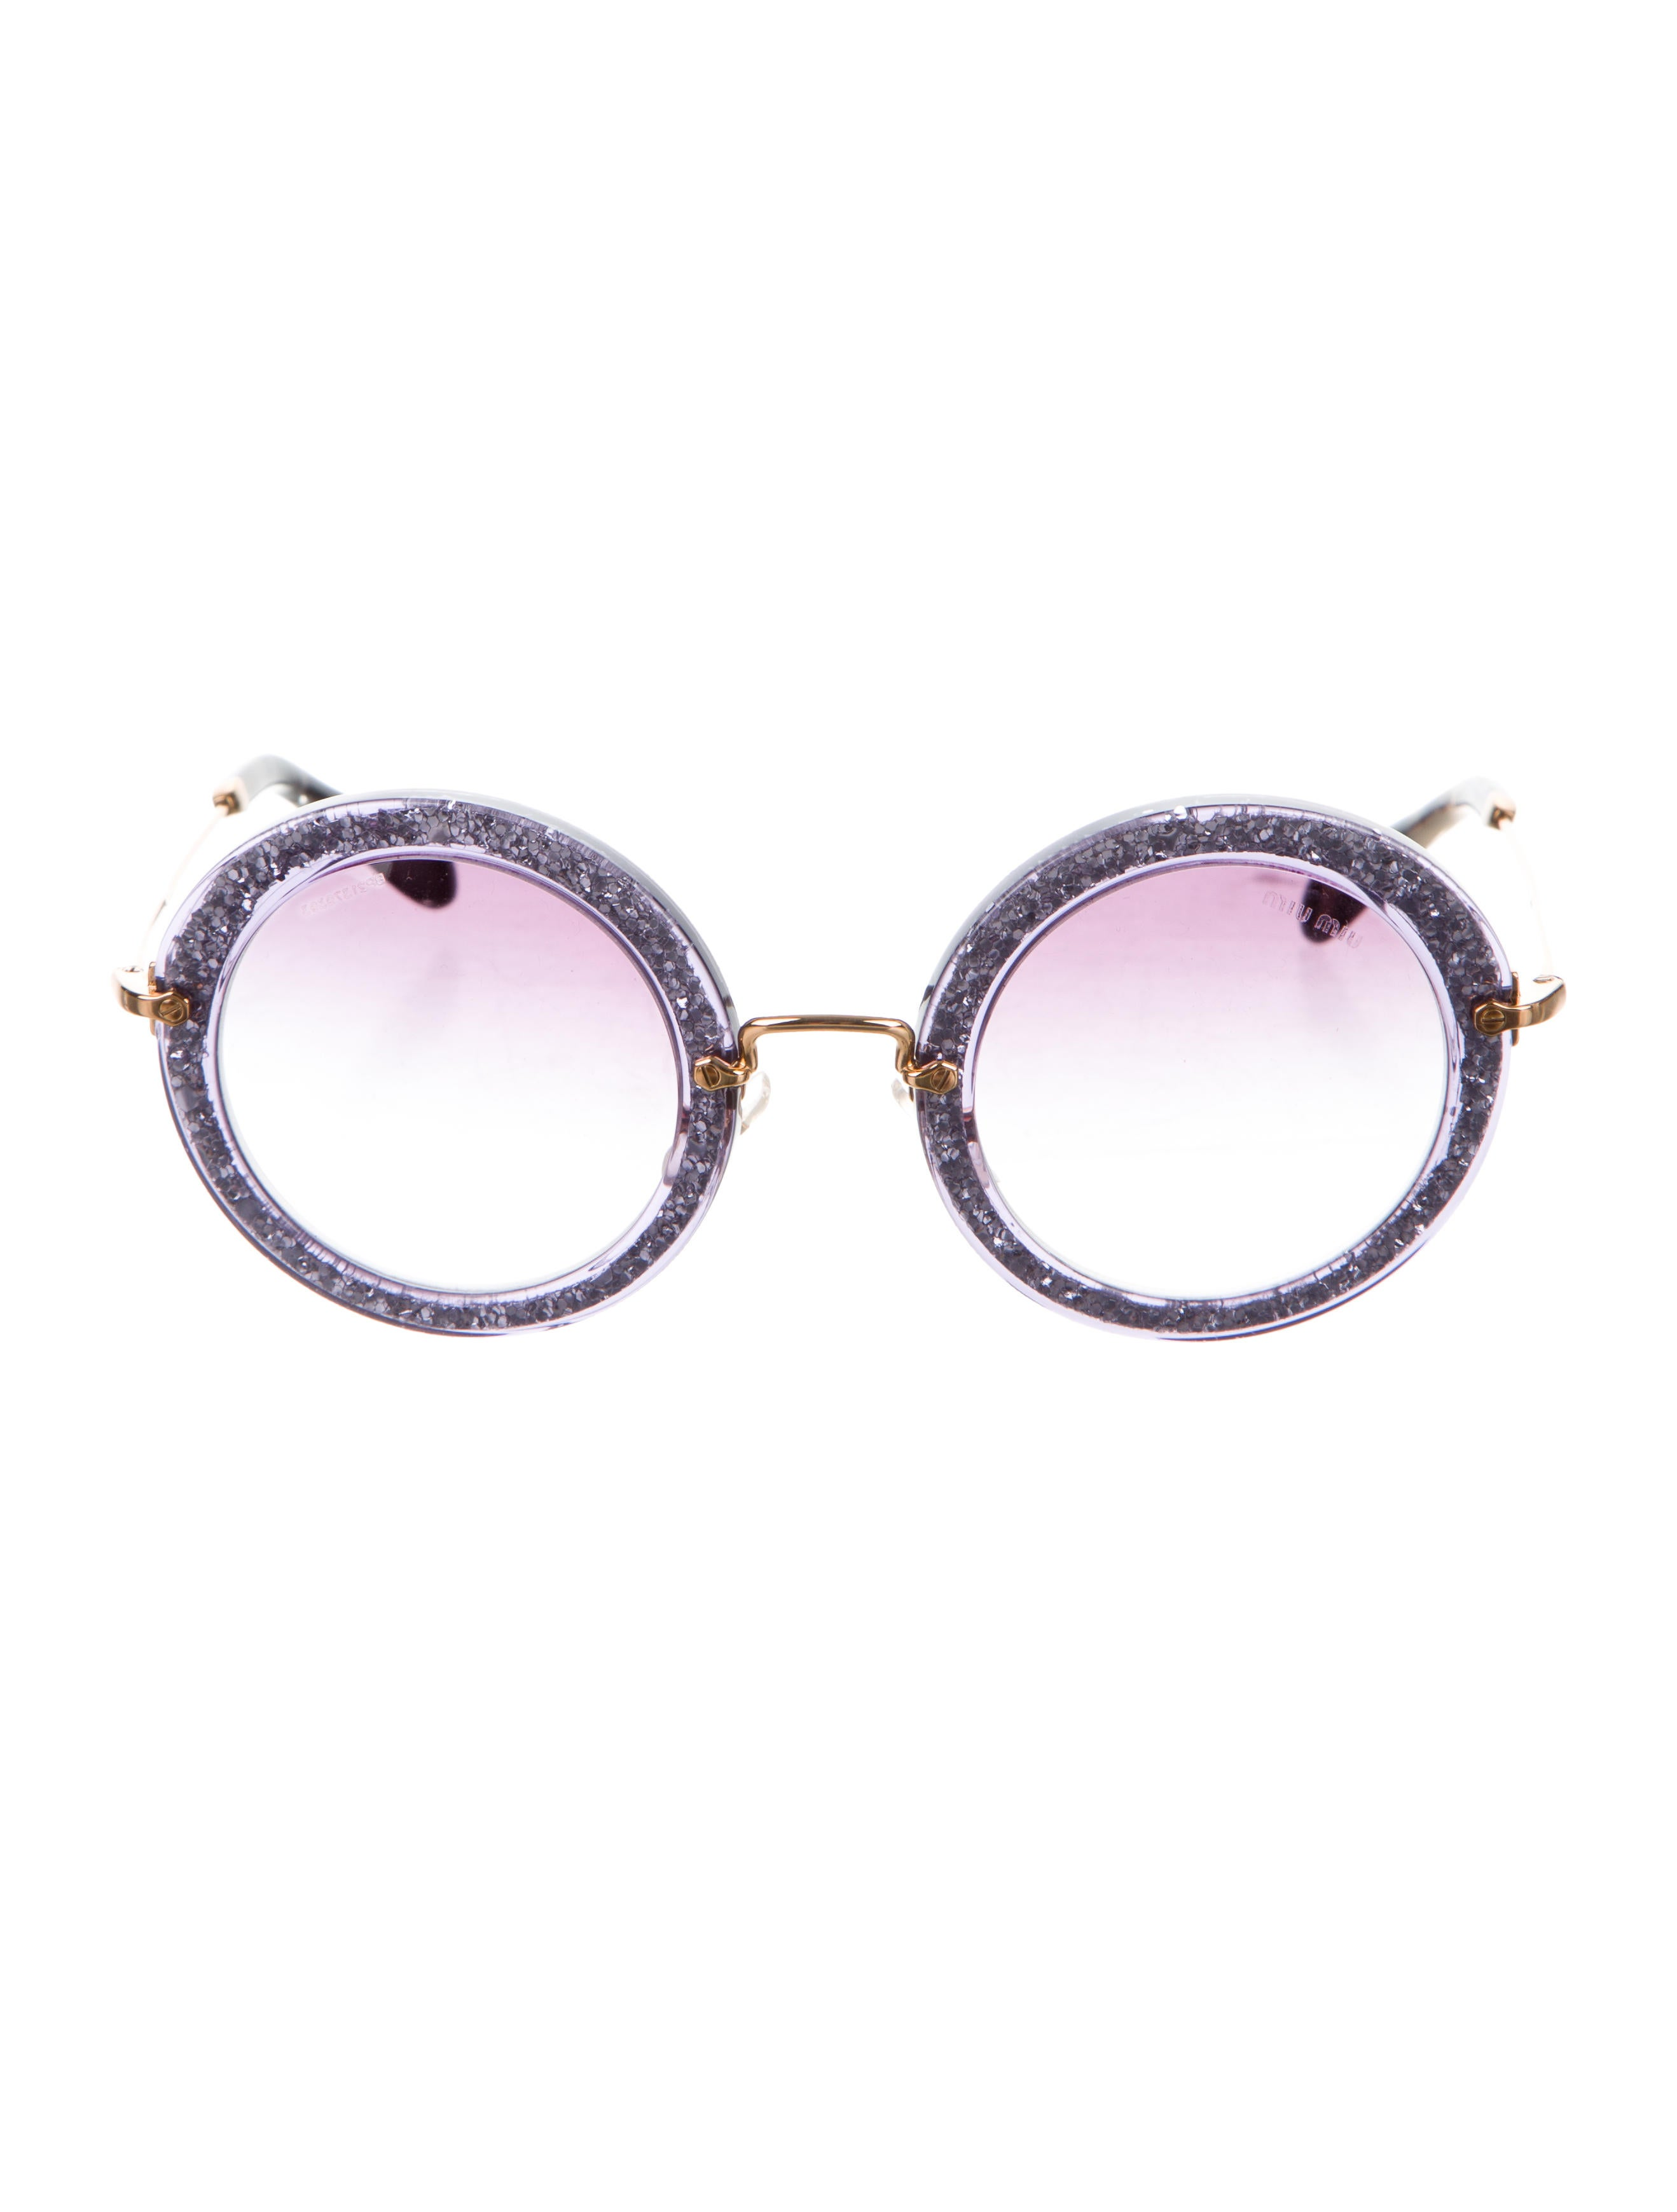 3f1eda3d8072 Miu Miu Glitter Noir Sunglasses - Accessories - MIU52020